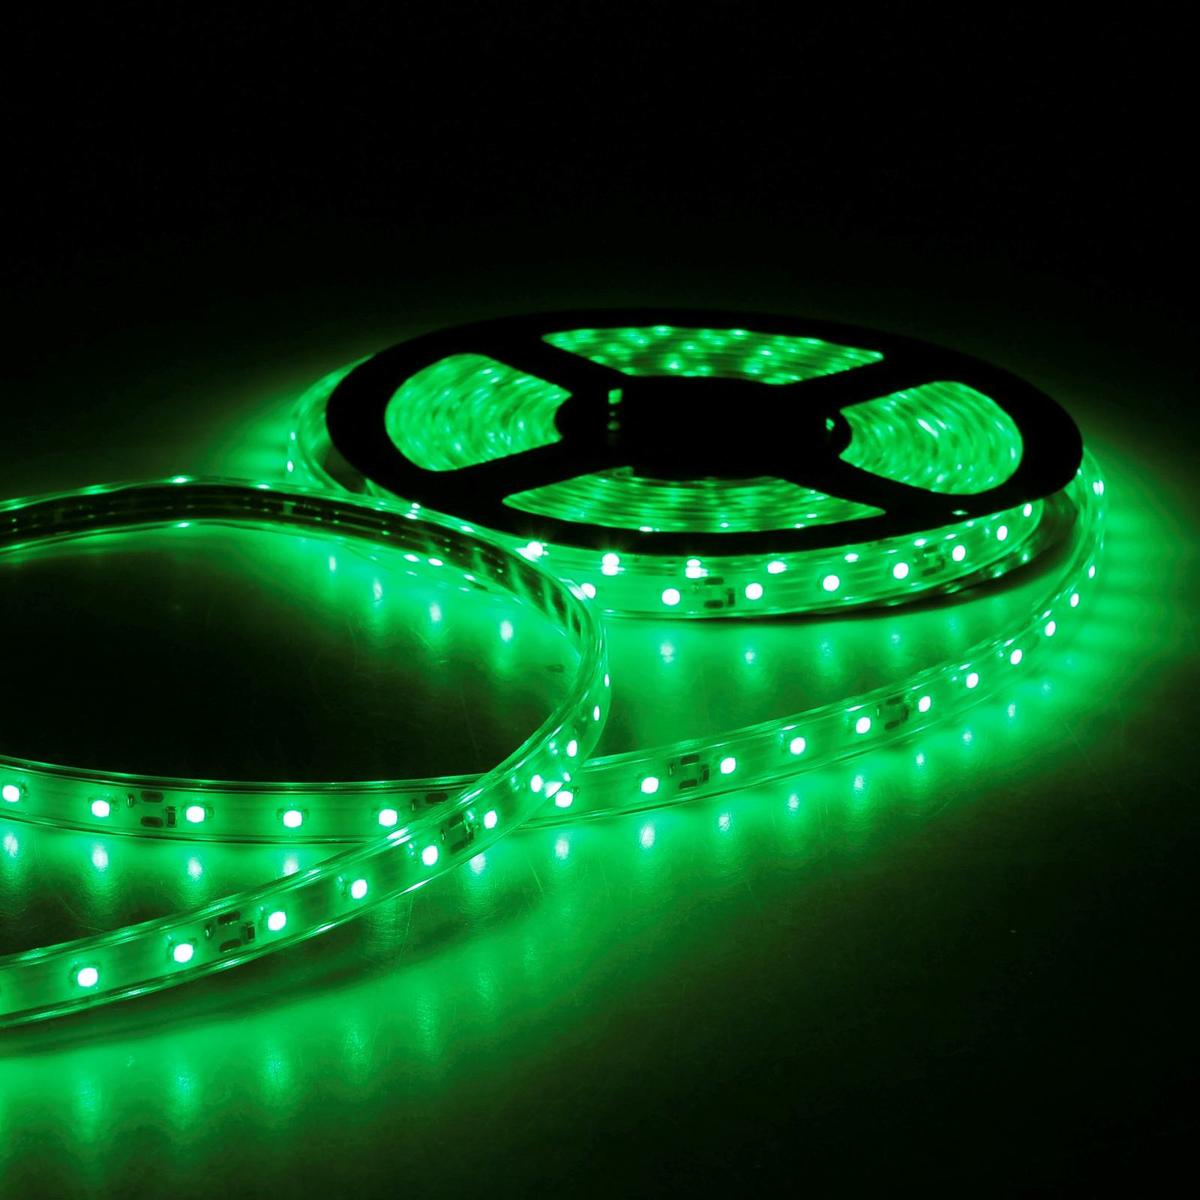 Светодиодная лента Sima-land, 12В, SMD3528, длина 5 м, IP68, 60 LED ламп, 4.8 Вт/м, 6-7 Лм/1 LED, DC, цвет: зеленый светодиодная лента luazon 12в smd3528 длина 5 м ip68 60 led ламп 4 8 вт м 6 7 лм 1 led dc цвет фиолетовый